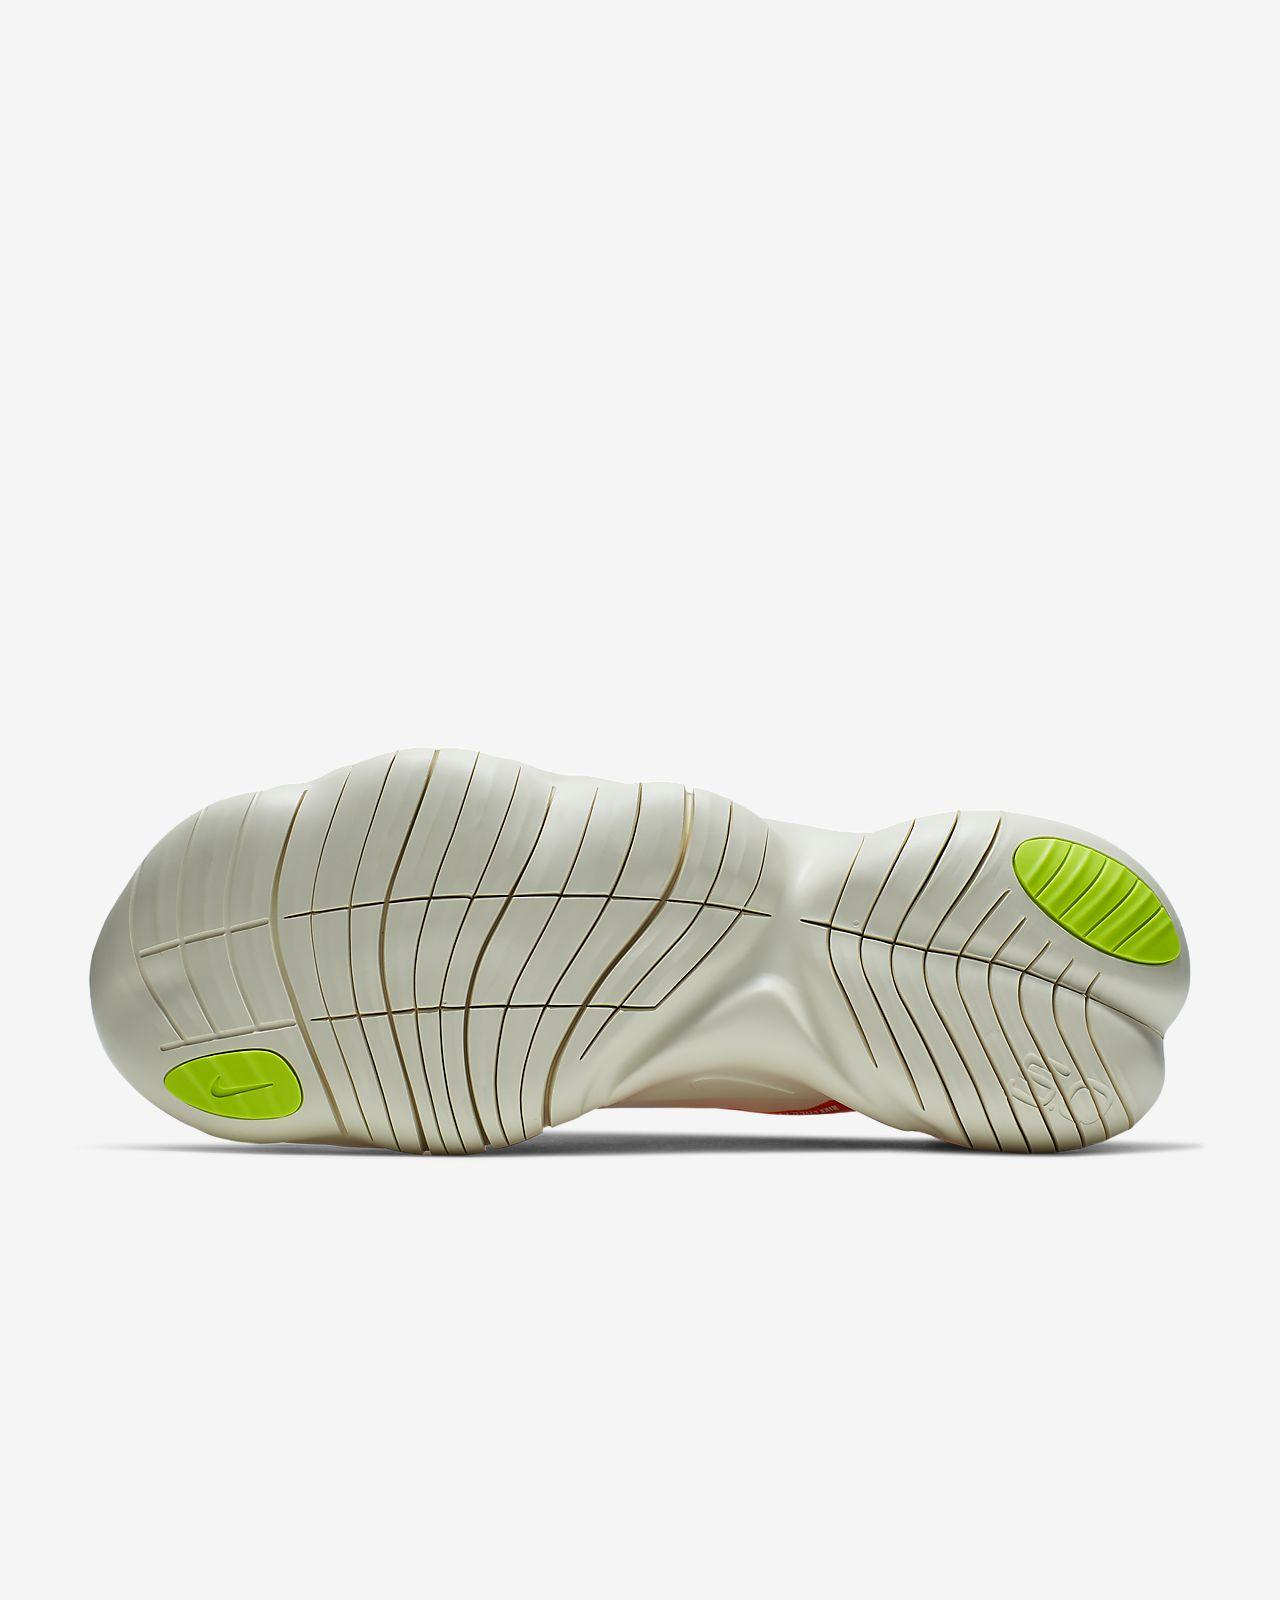 san francisco 79099 e4da7 Nike Free RN 5.0 NRG